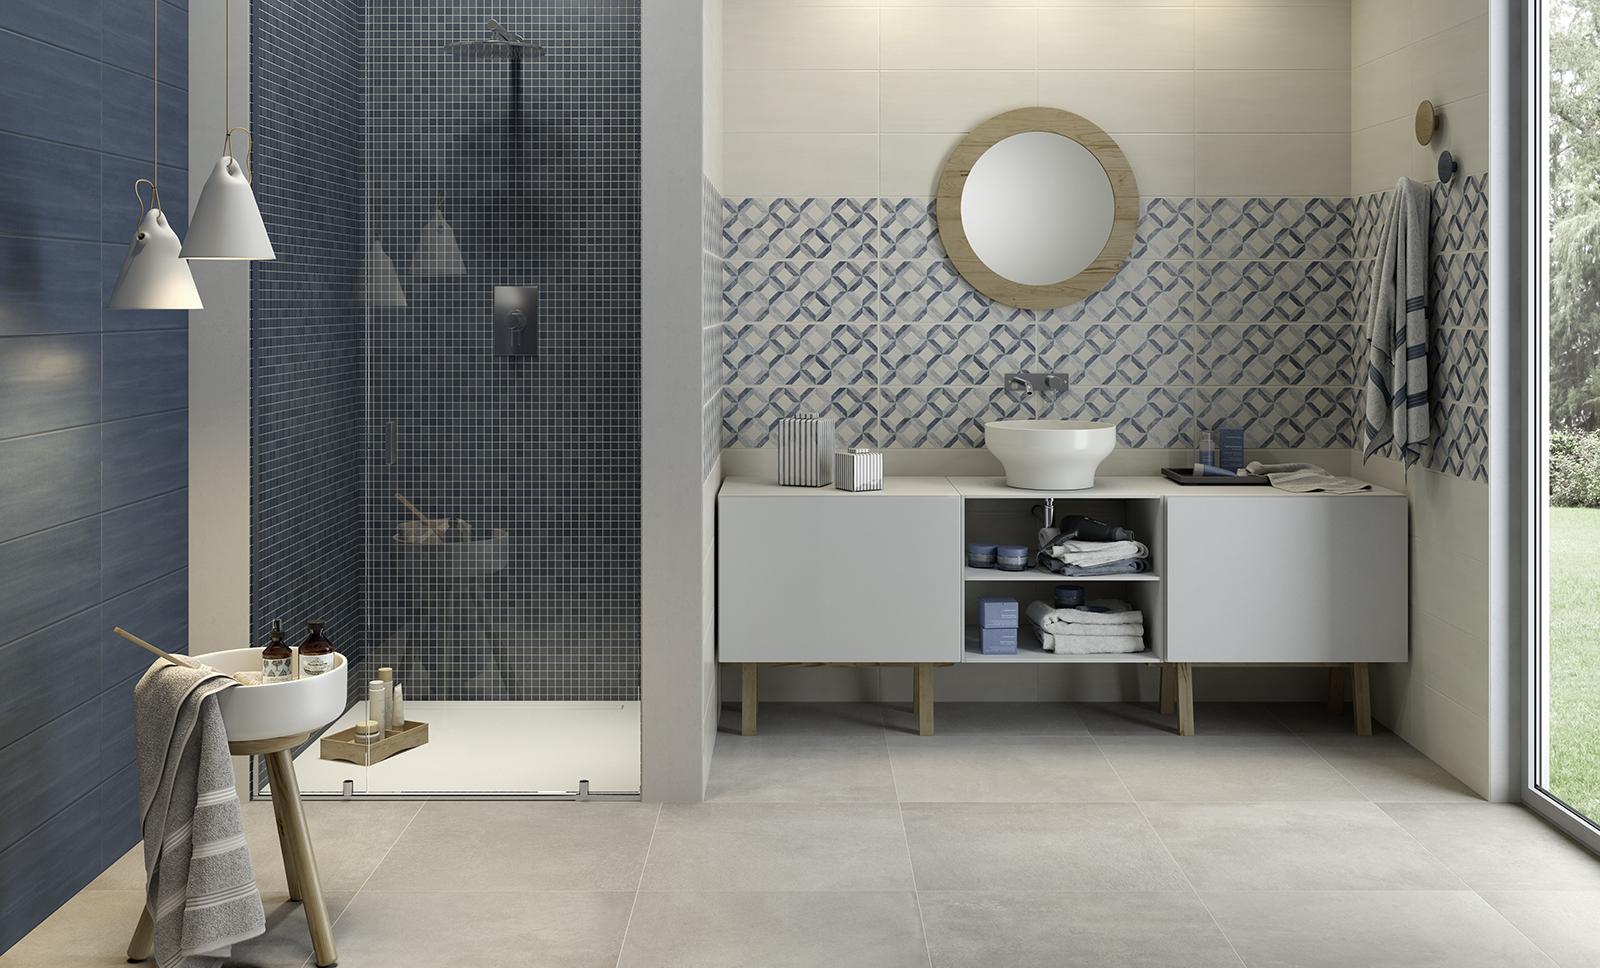 Mosaik Fliesen Dusche Pflege : Ceramic Tile Bathroom